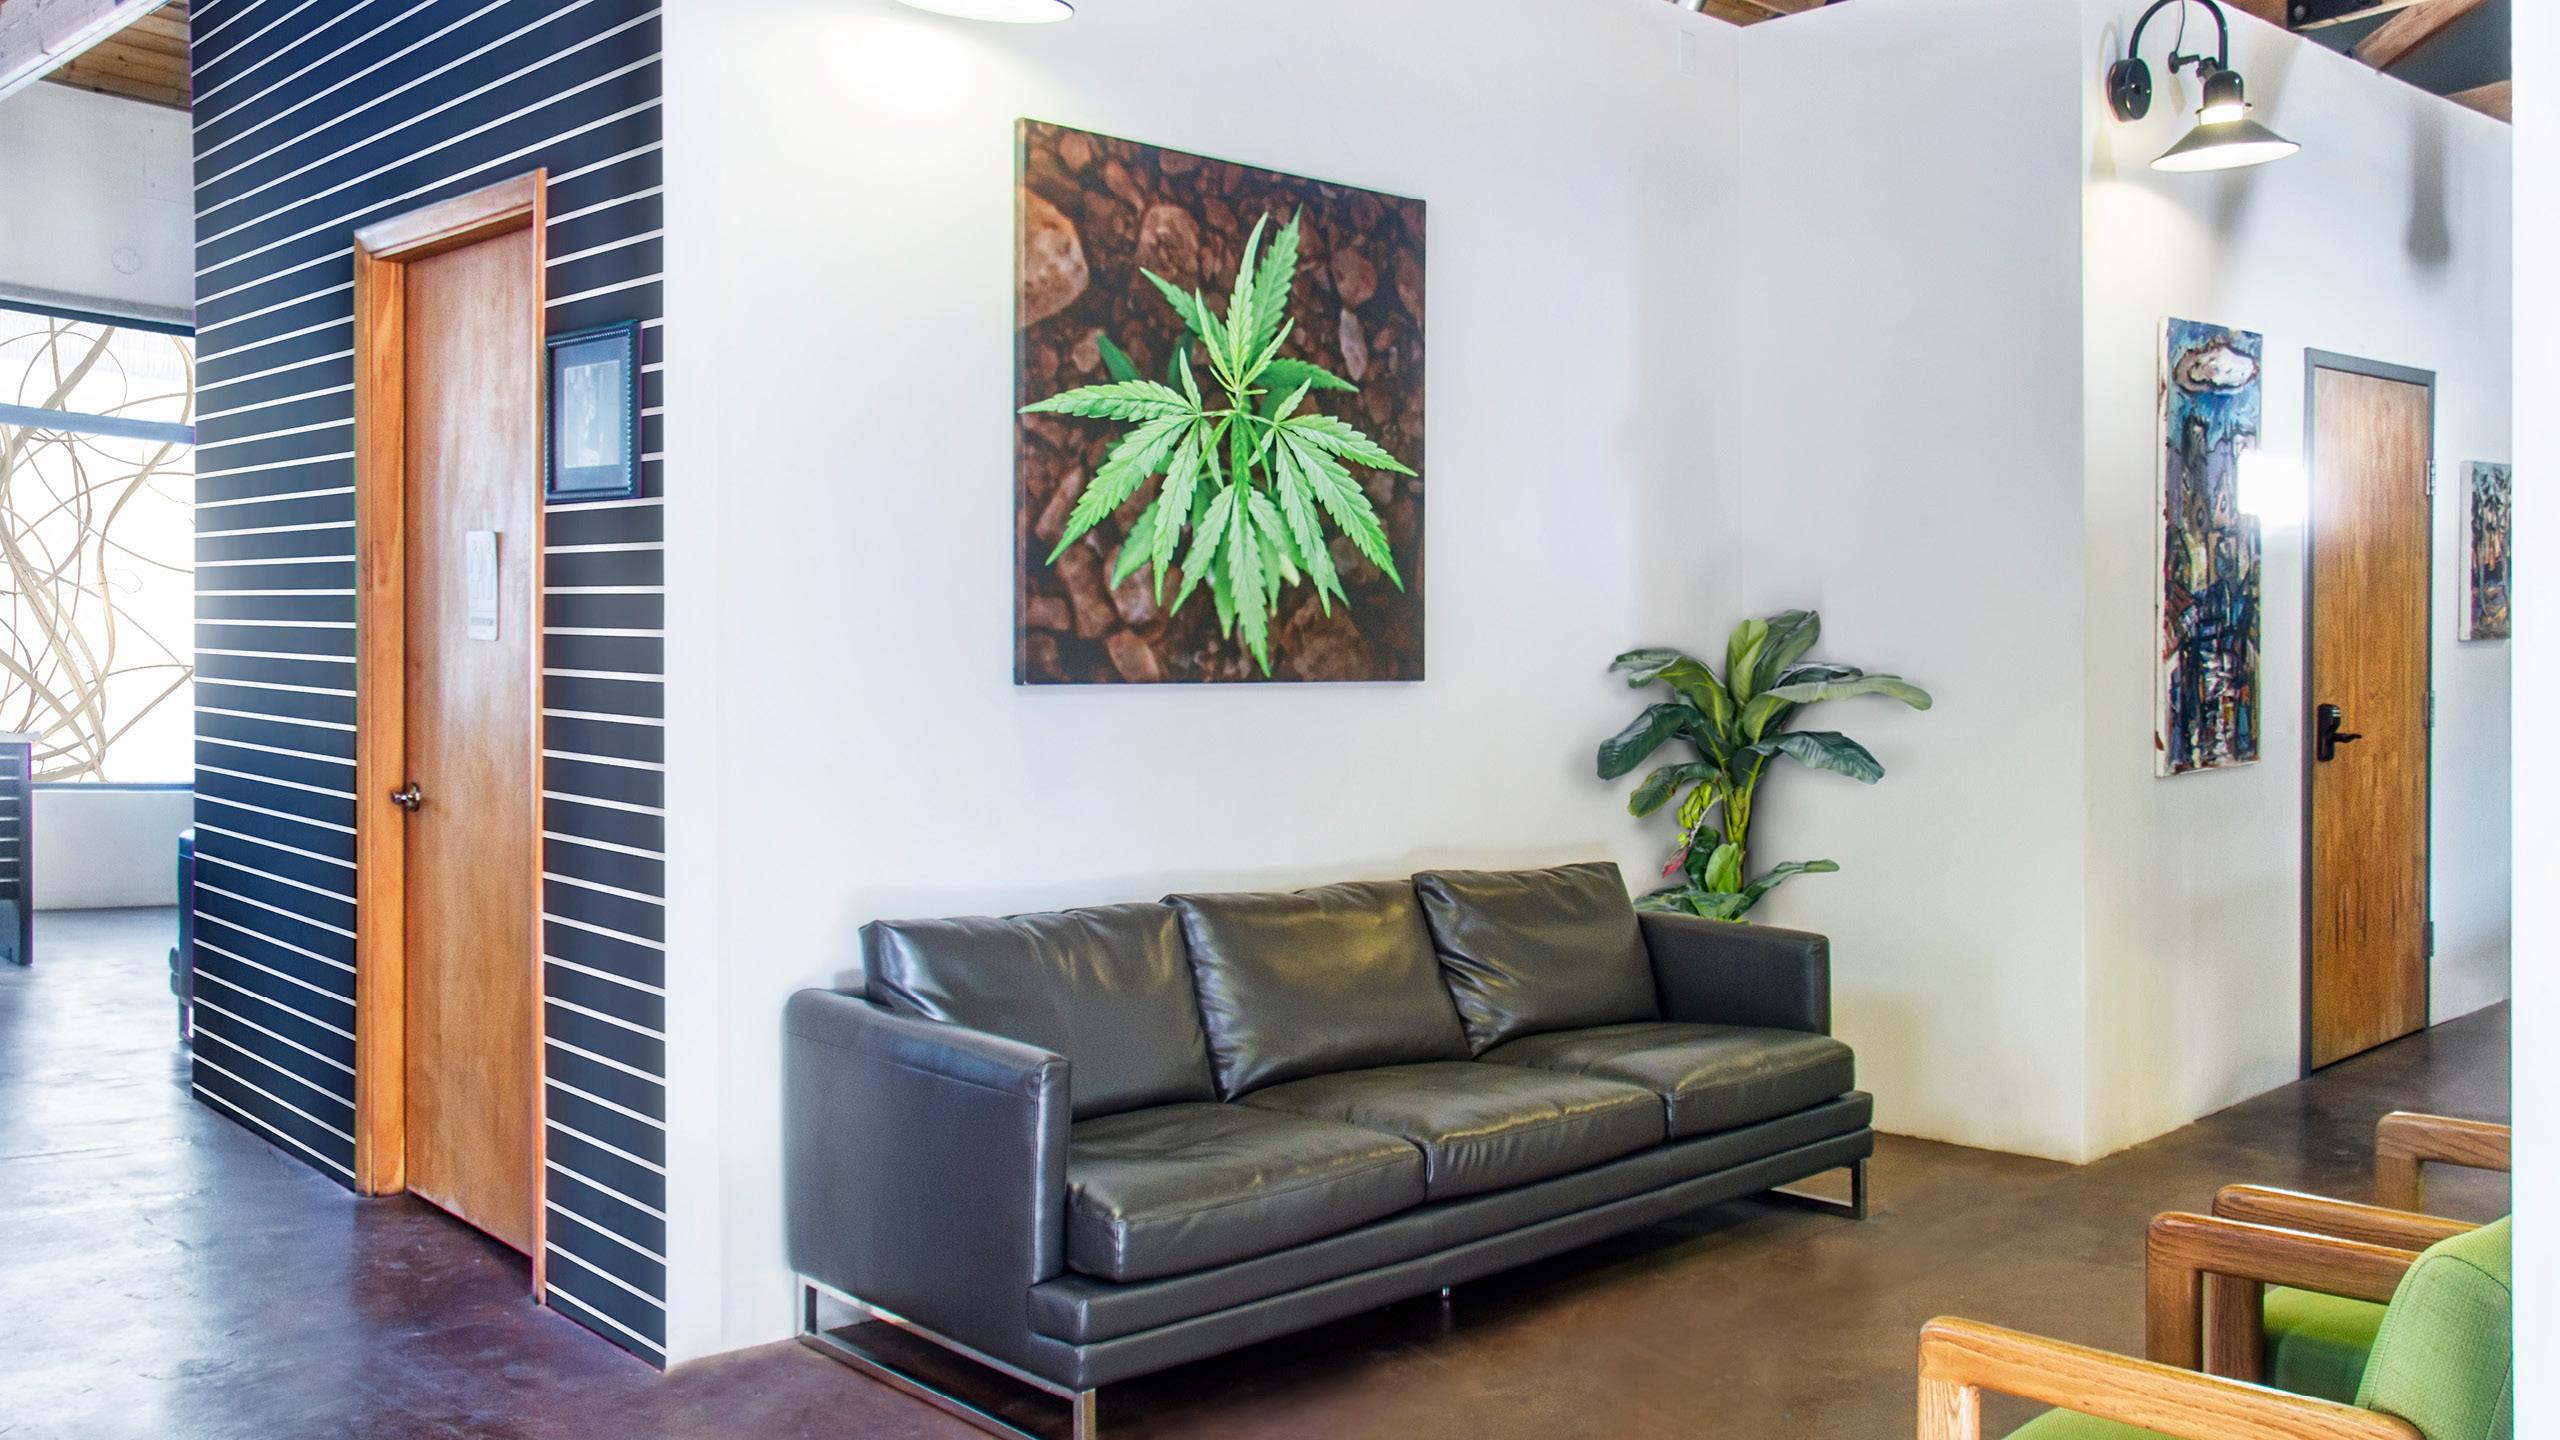 Minerva Canna Group Retail Interior Design by High Road Design Studio